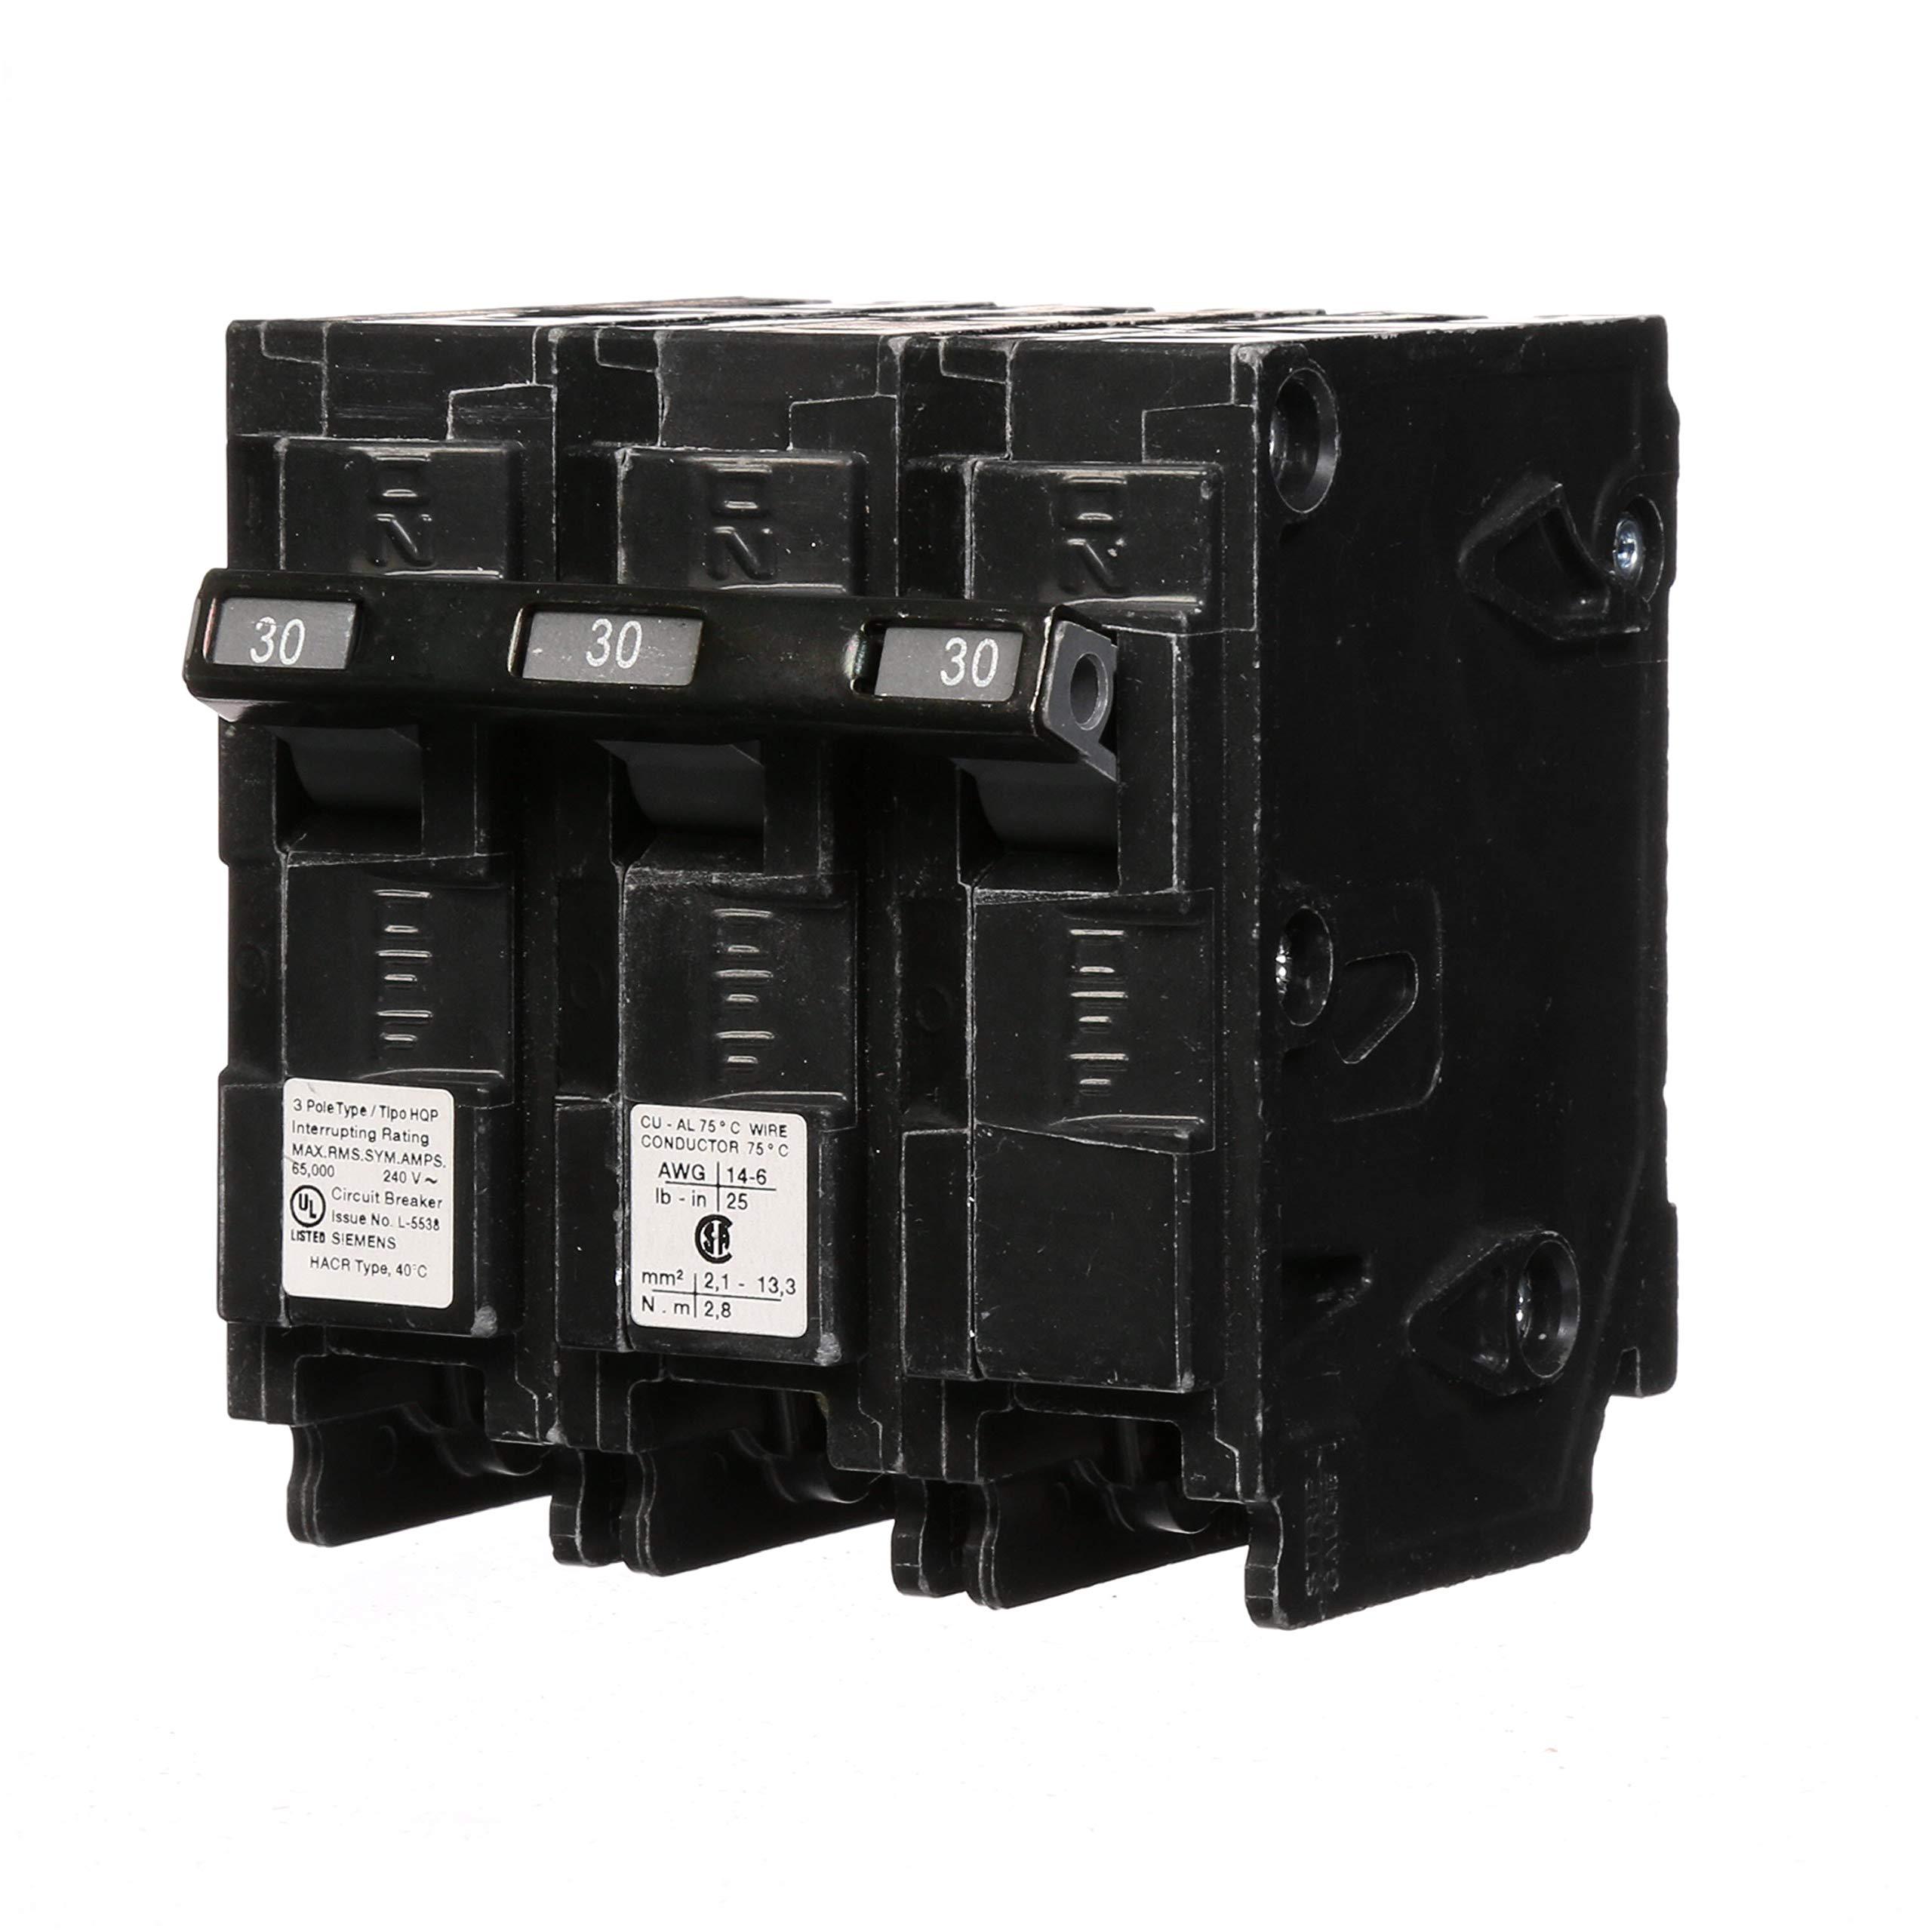 Q330HH 30-Amp Three Pole 65kA Type HQP Circuit Breaker